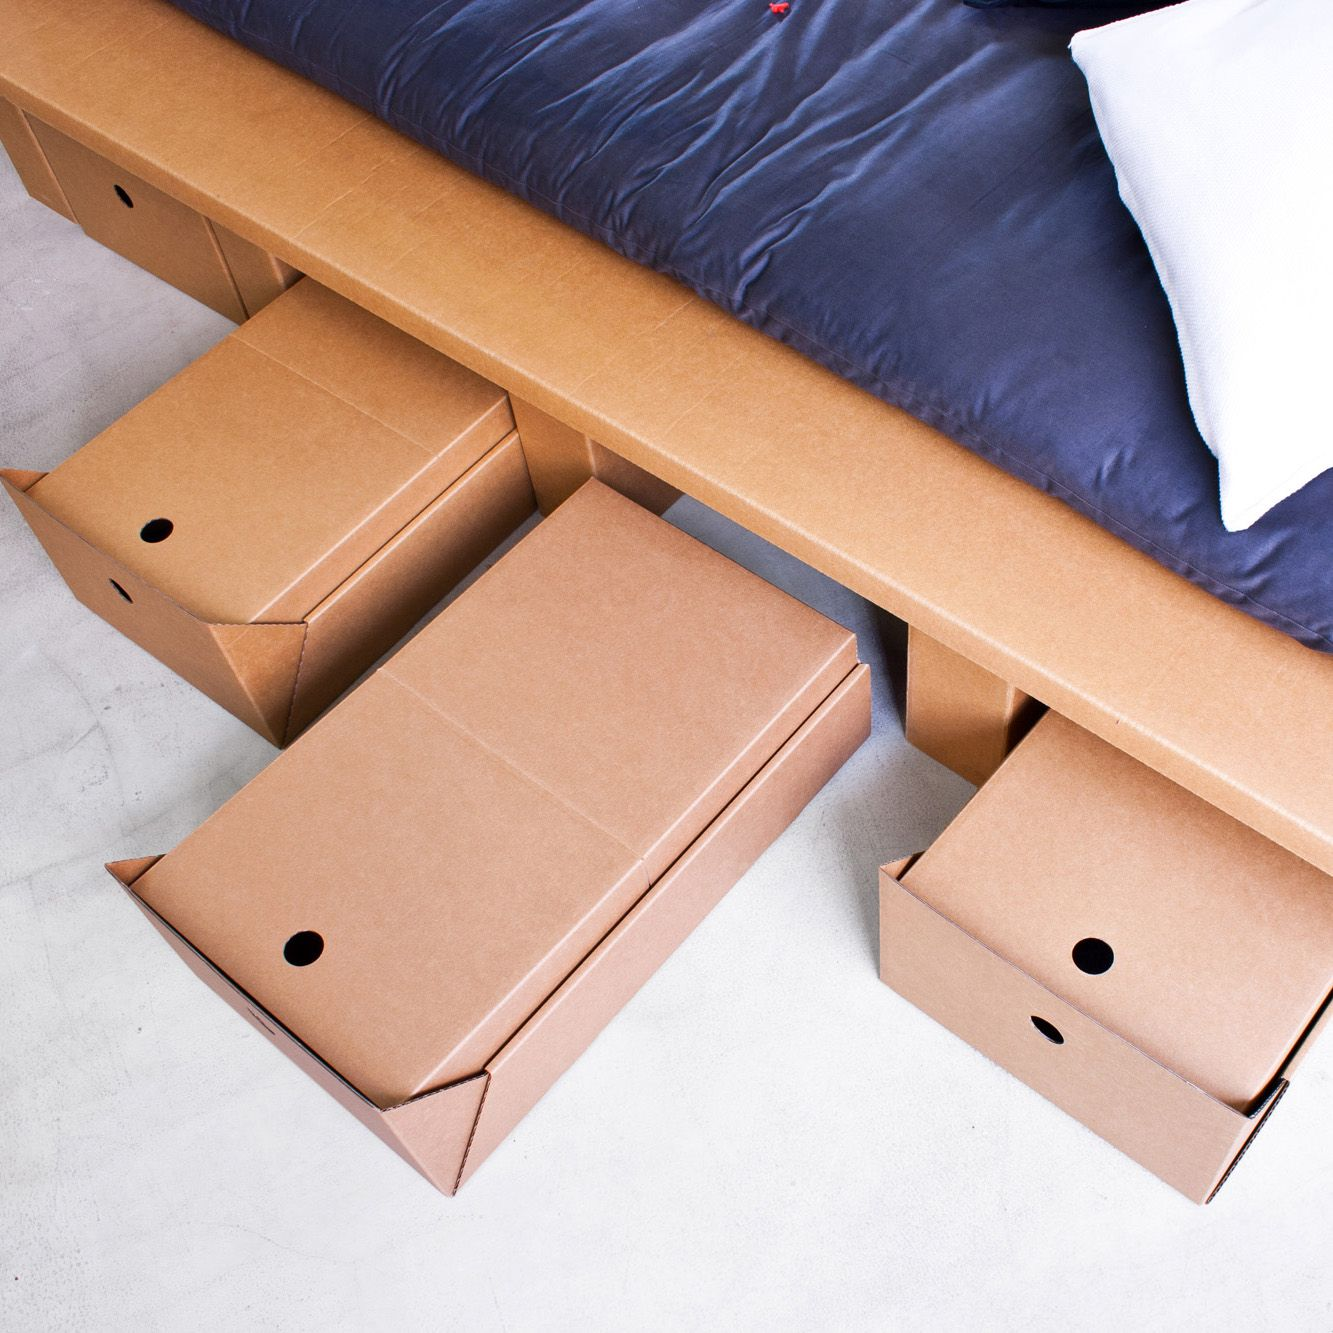 cardboard bed with drawers stange design berlin wohnen karton m bel m bel aus pappe und. Black Bedroom Furniture Sets. Home Design Ideas